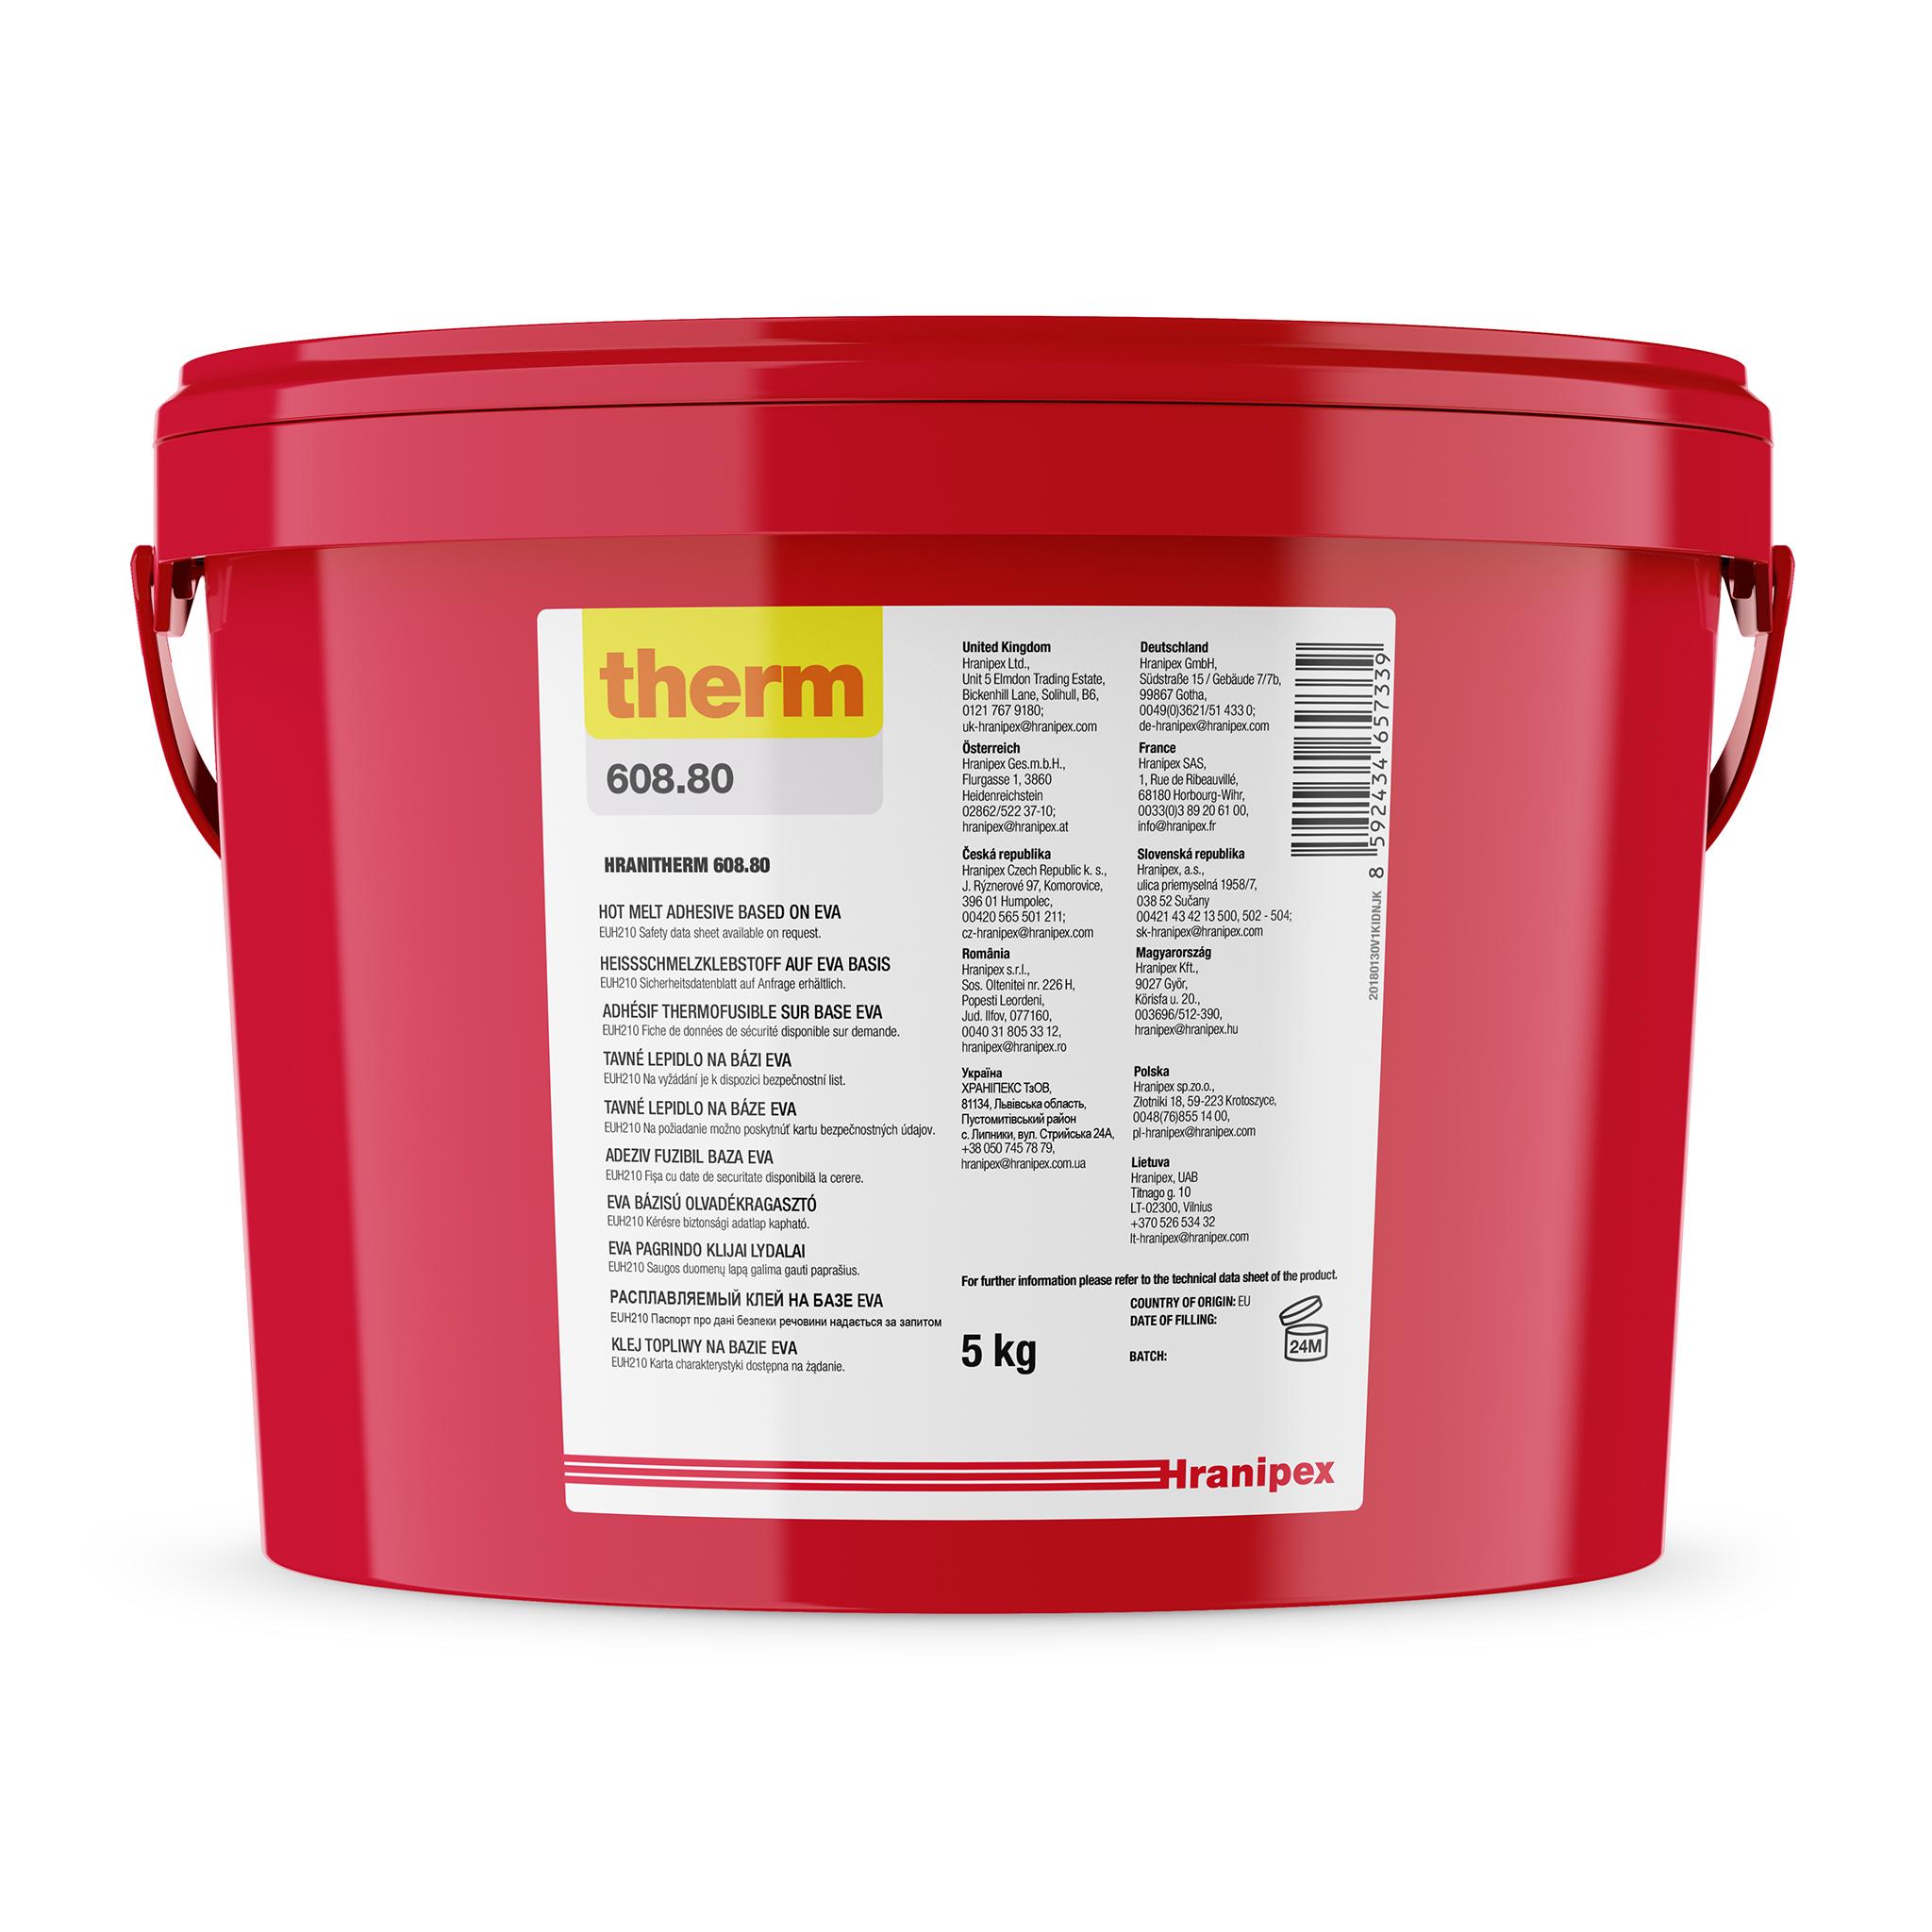 HRANITHERM 608.80 Naturale - EVA termofusibile 5 kg granule